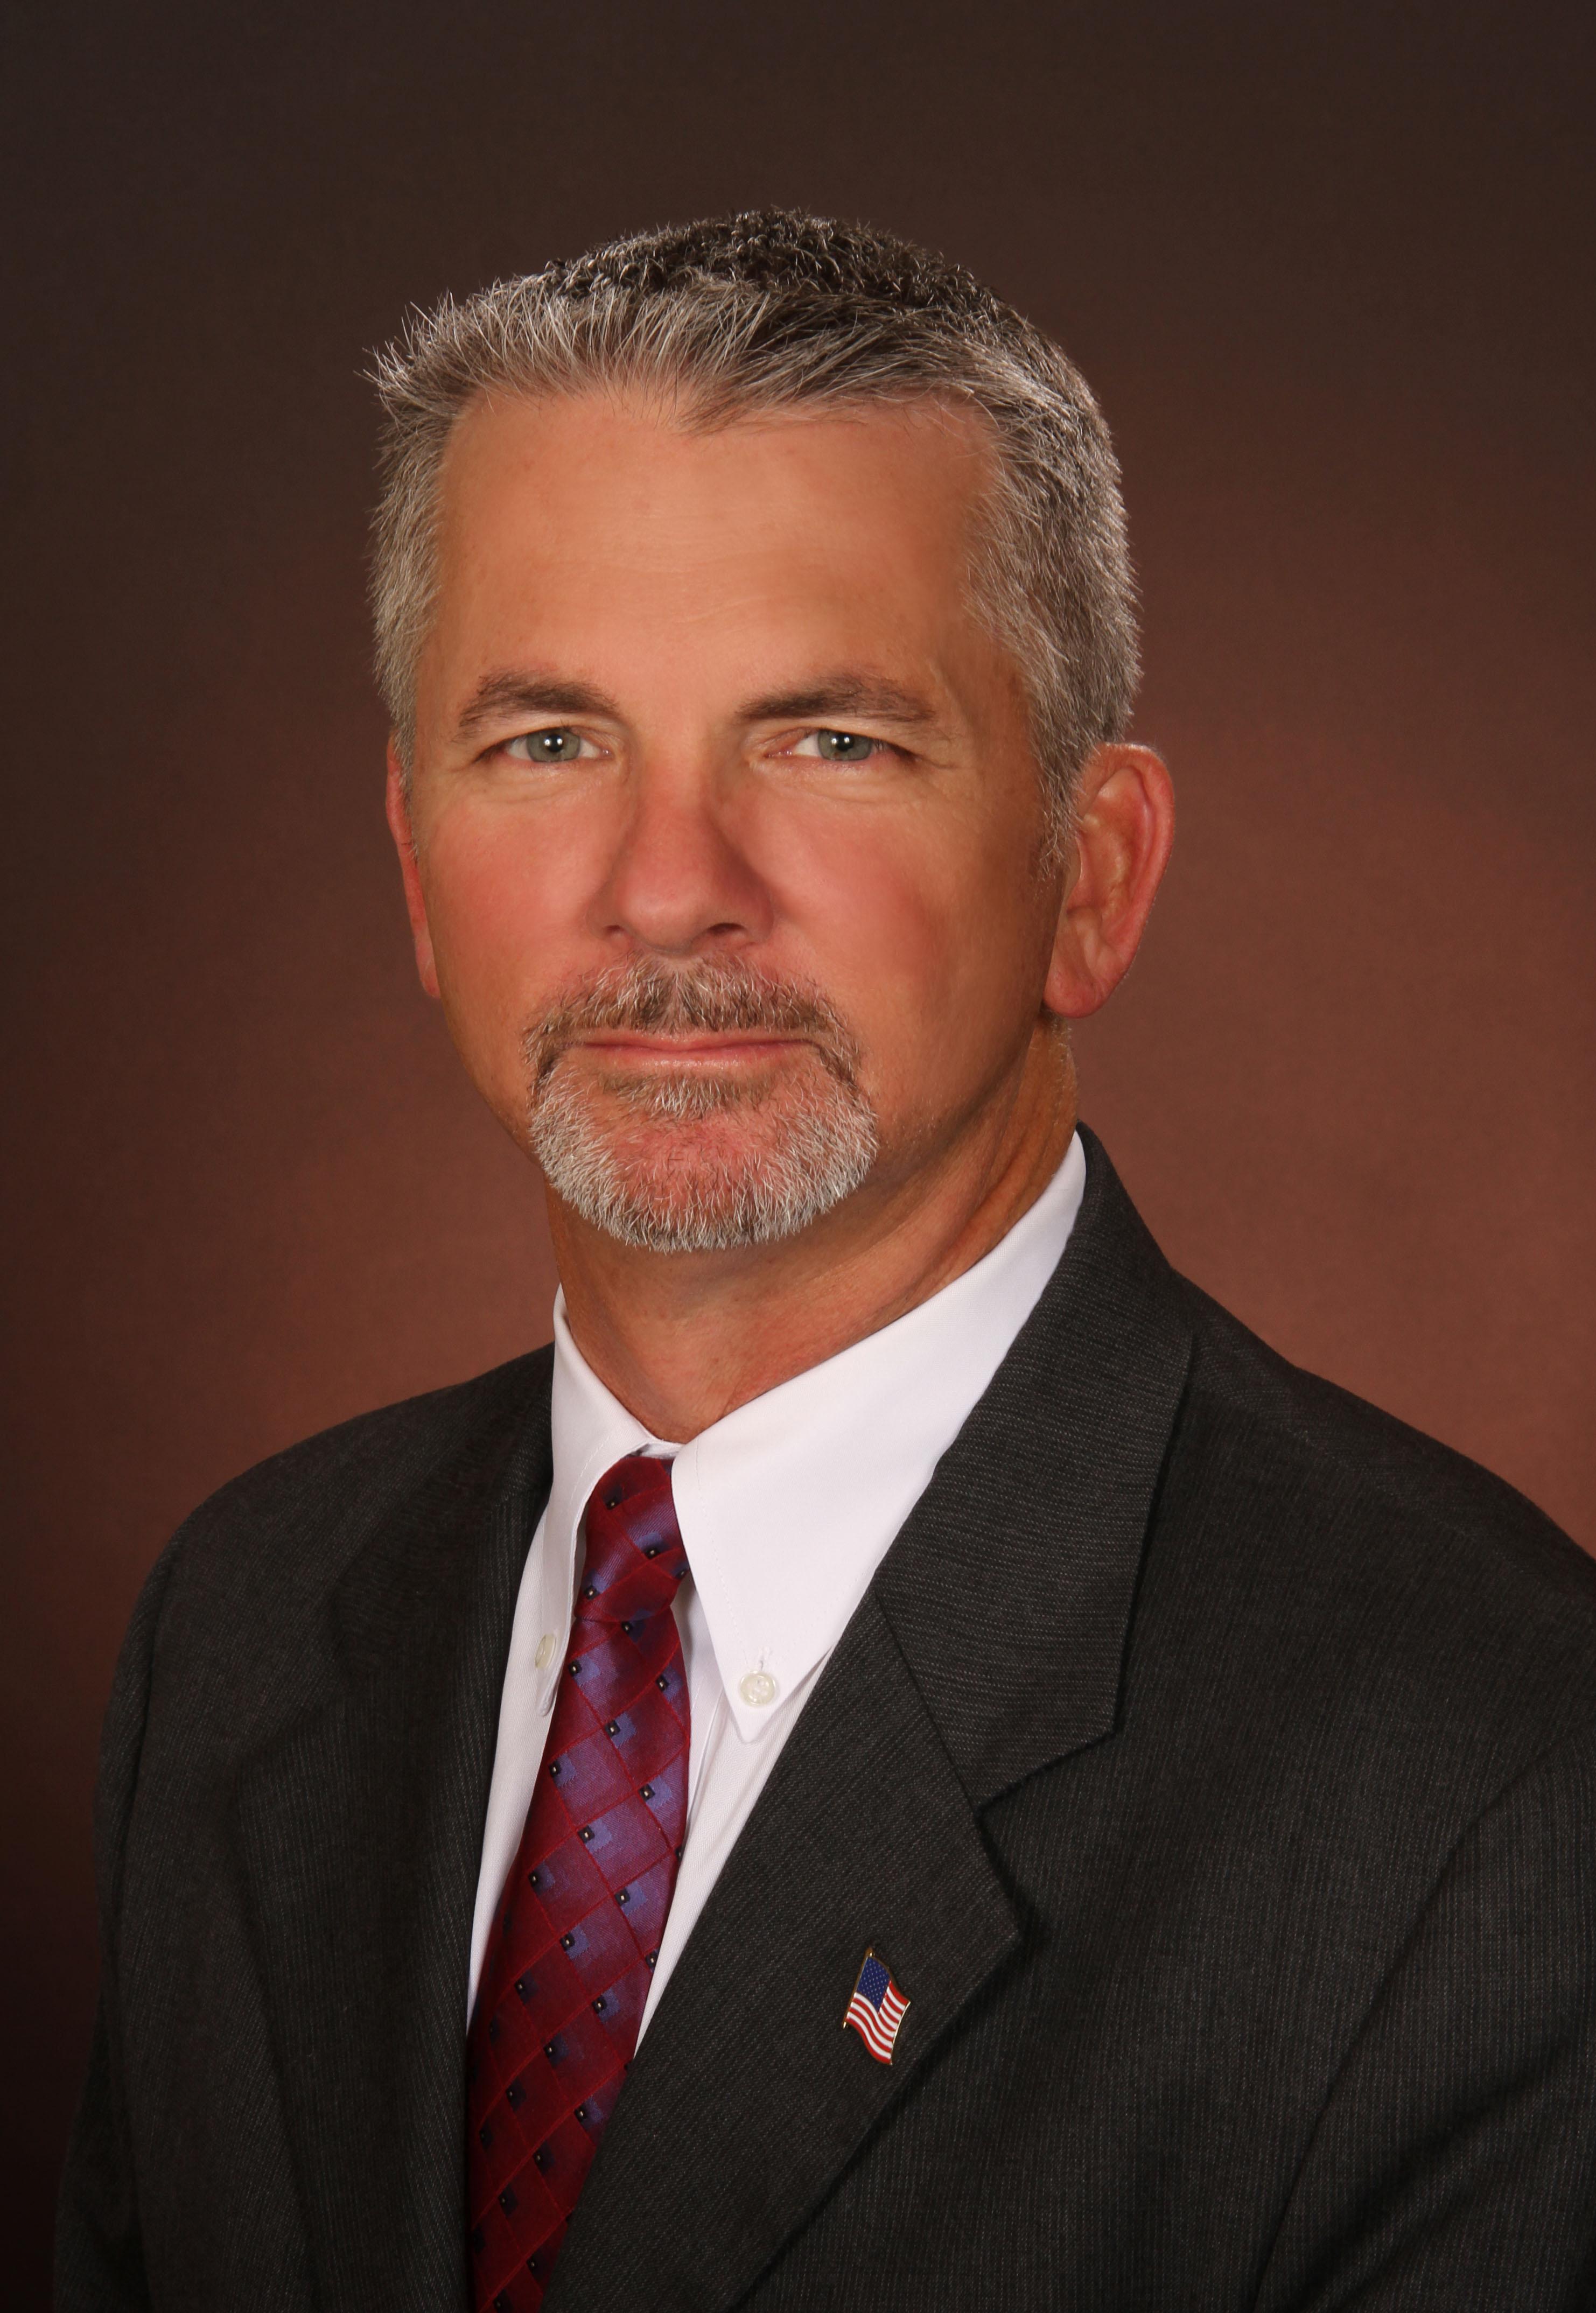 Mark Gillespie, Forensics Investigator